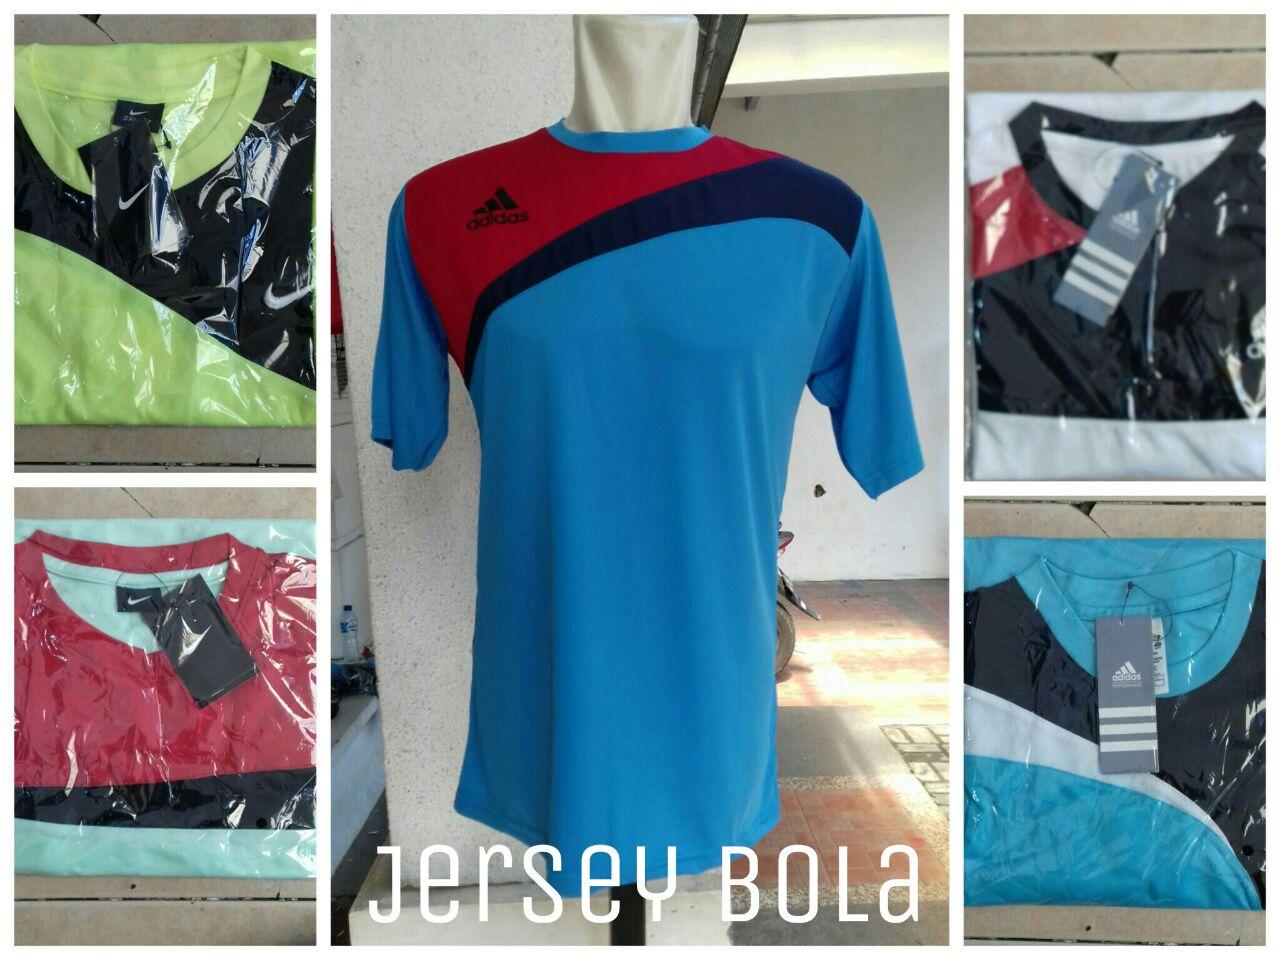 Sentra Grosir Kaos Jersey Bola Dewasa Murah Meriah Surabaya